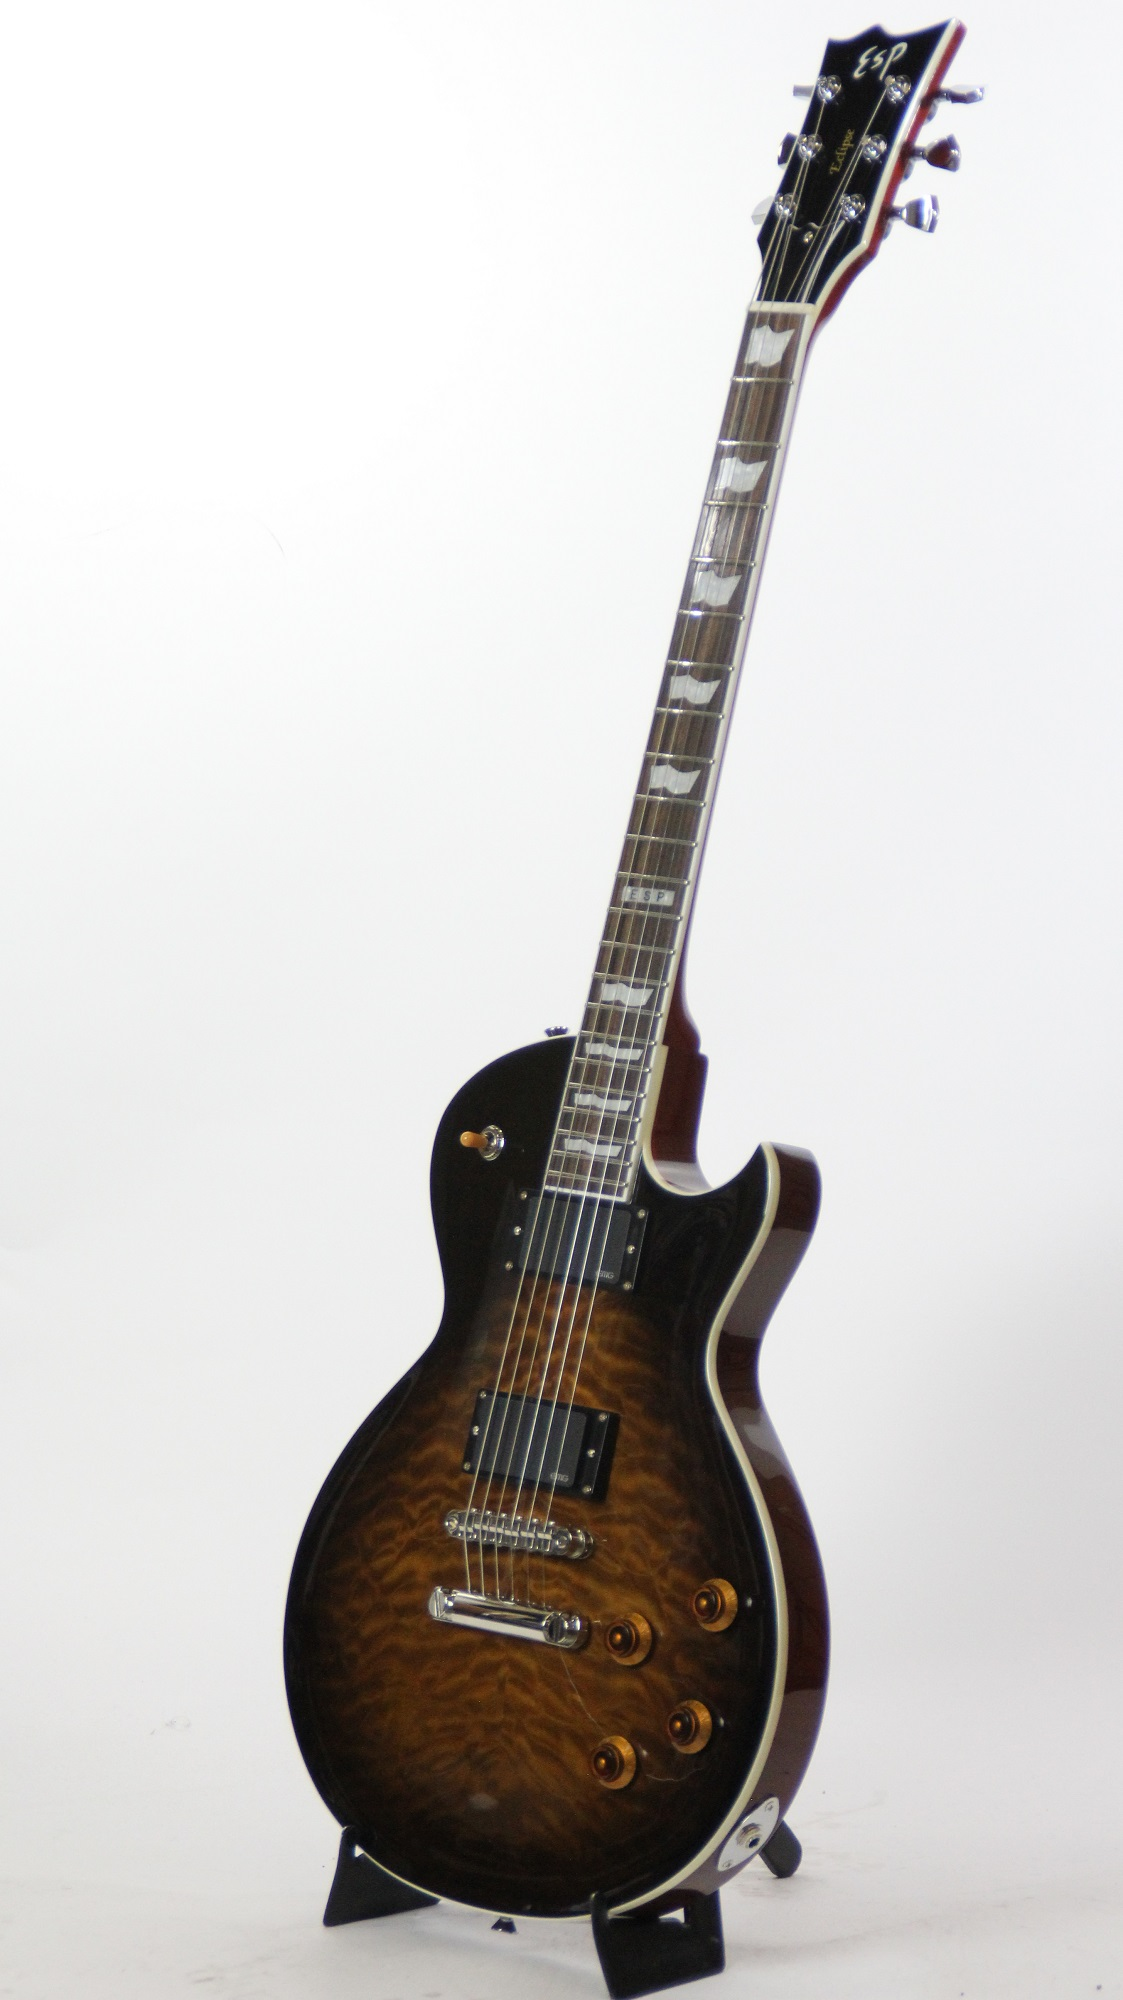 Emg Pickups Home Electric Guitar Pickups Bass Guitar Pickups